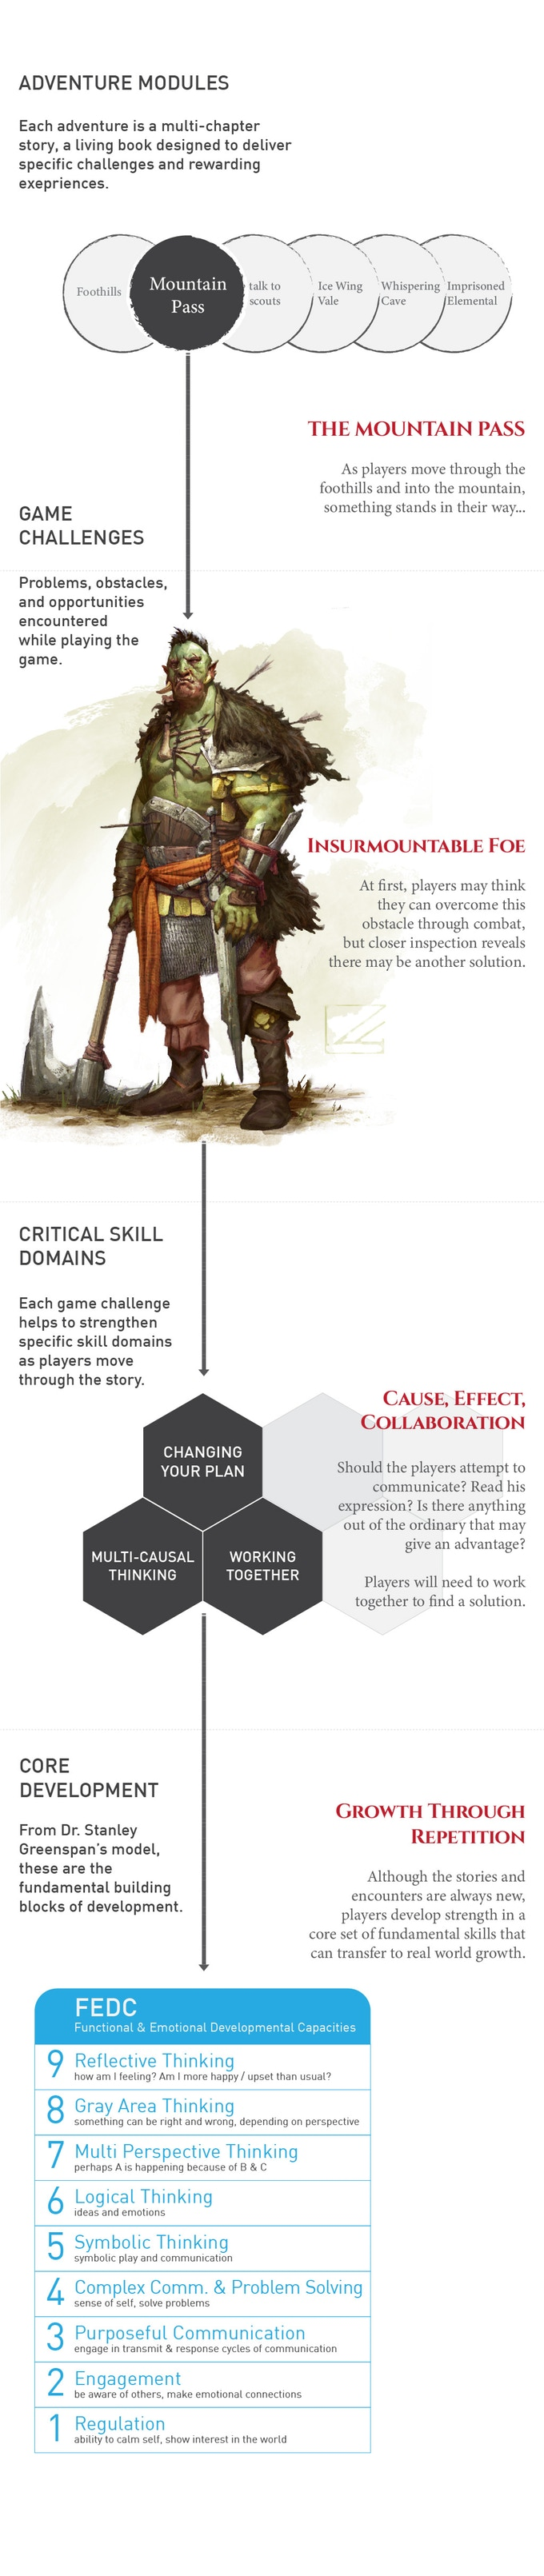 FEDC Model - critical core.jpg